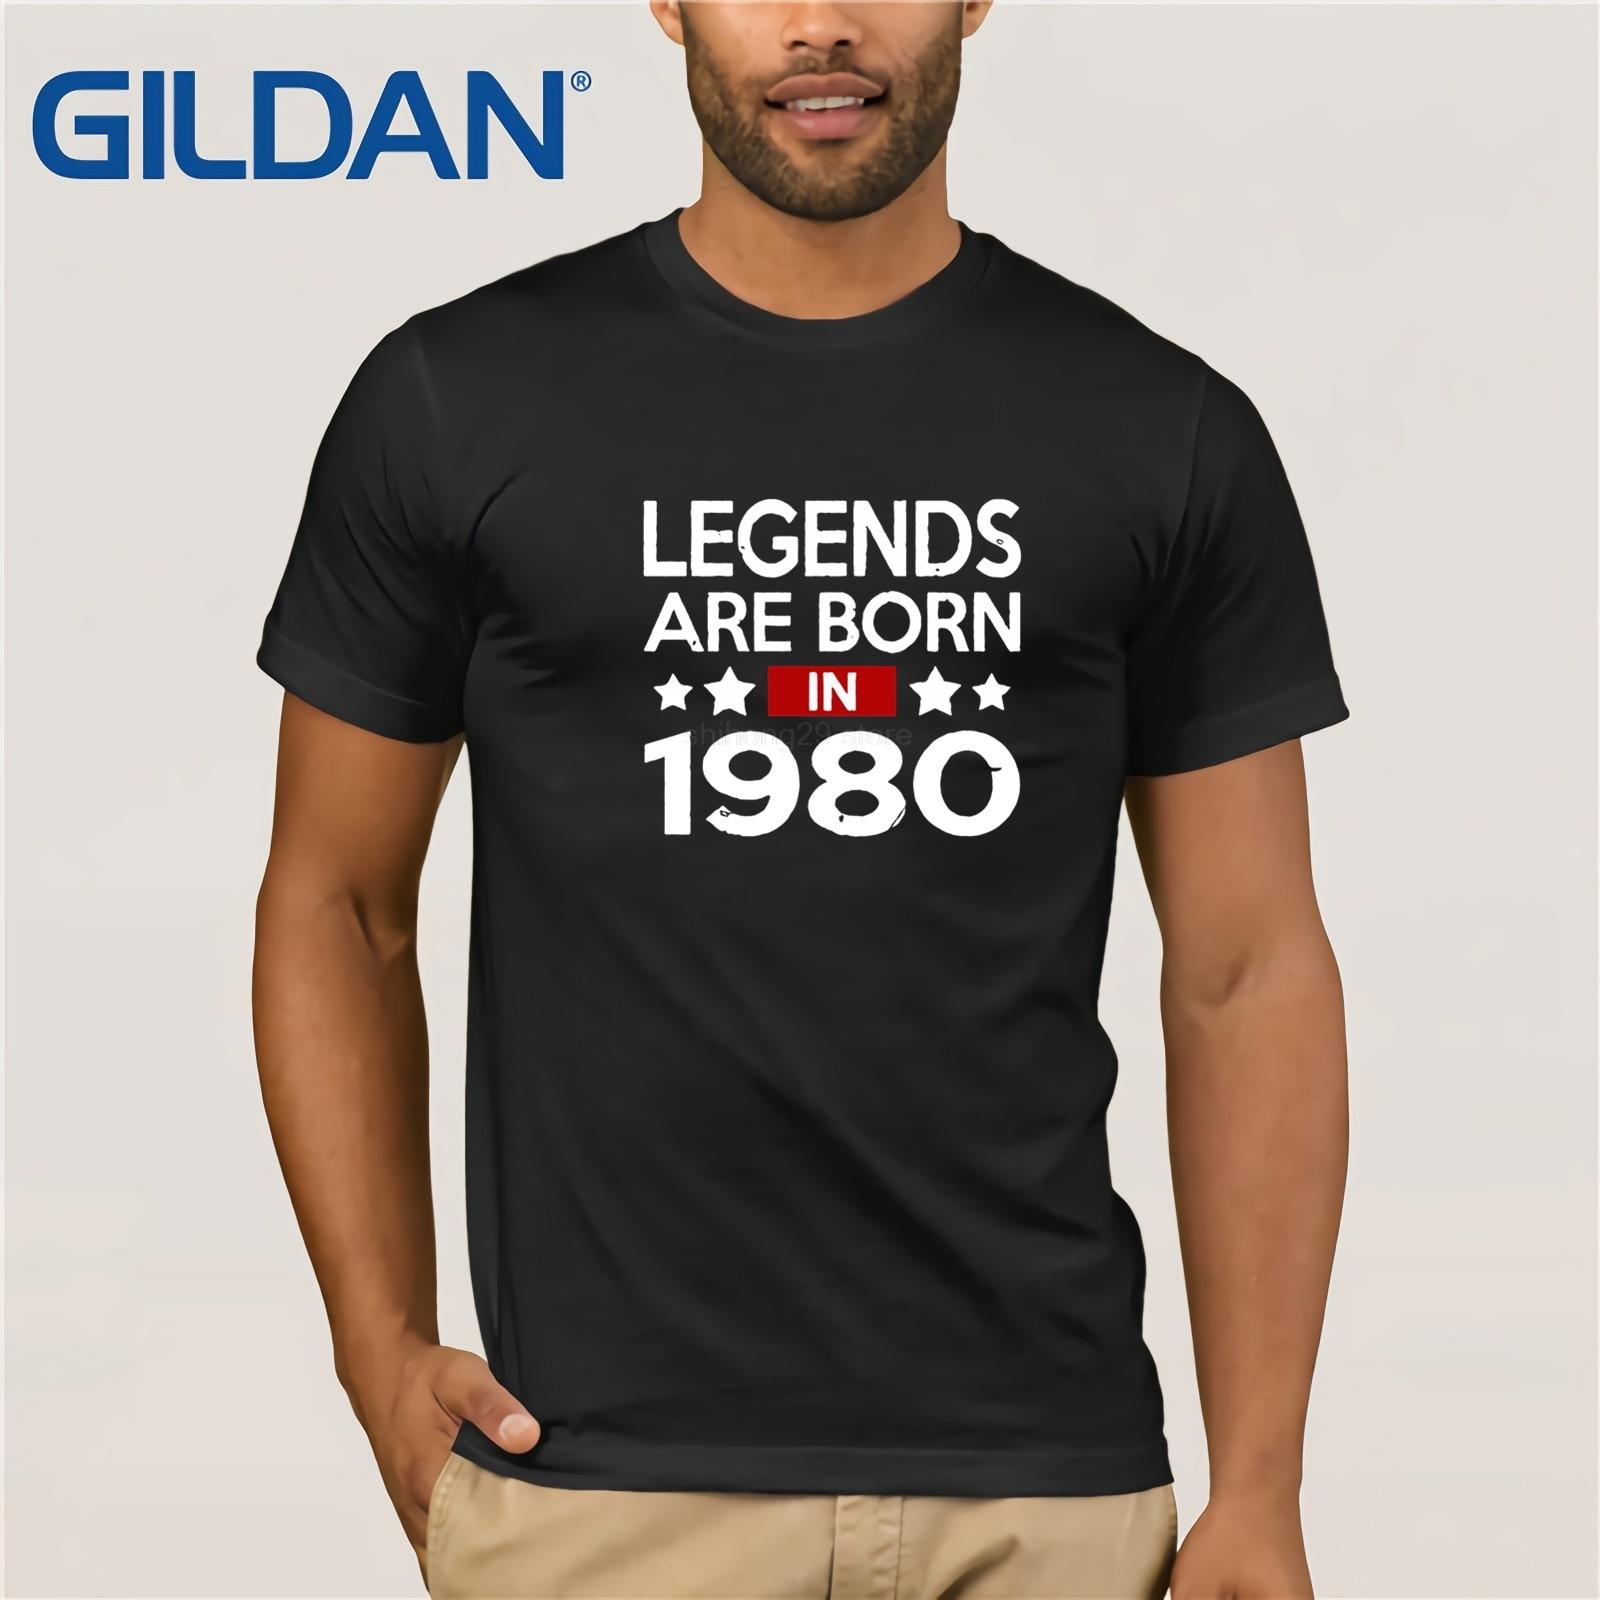 2019 Camiseta Vintage Shirt Legends Are Born In 1980 T Shirt Men Men Unisex T-Shirt 80s Retro Brand Clothing Tops Hipster Tees